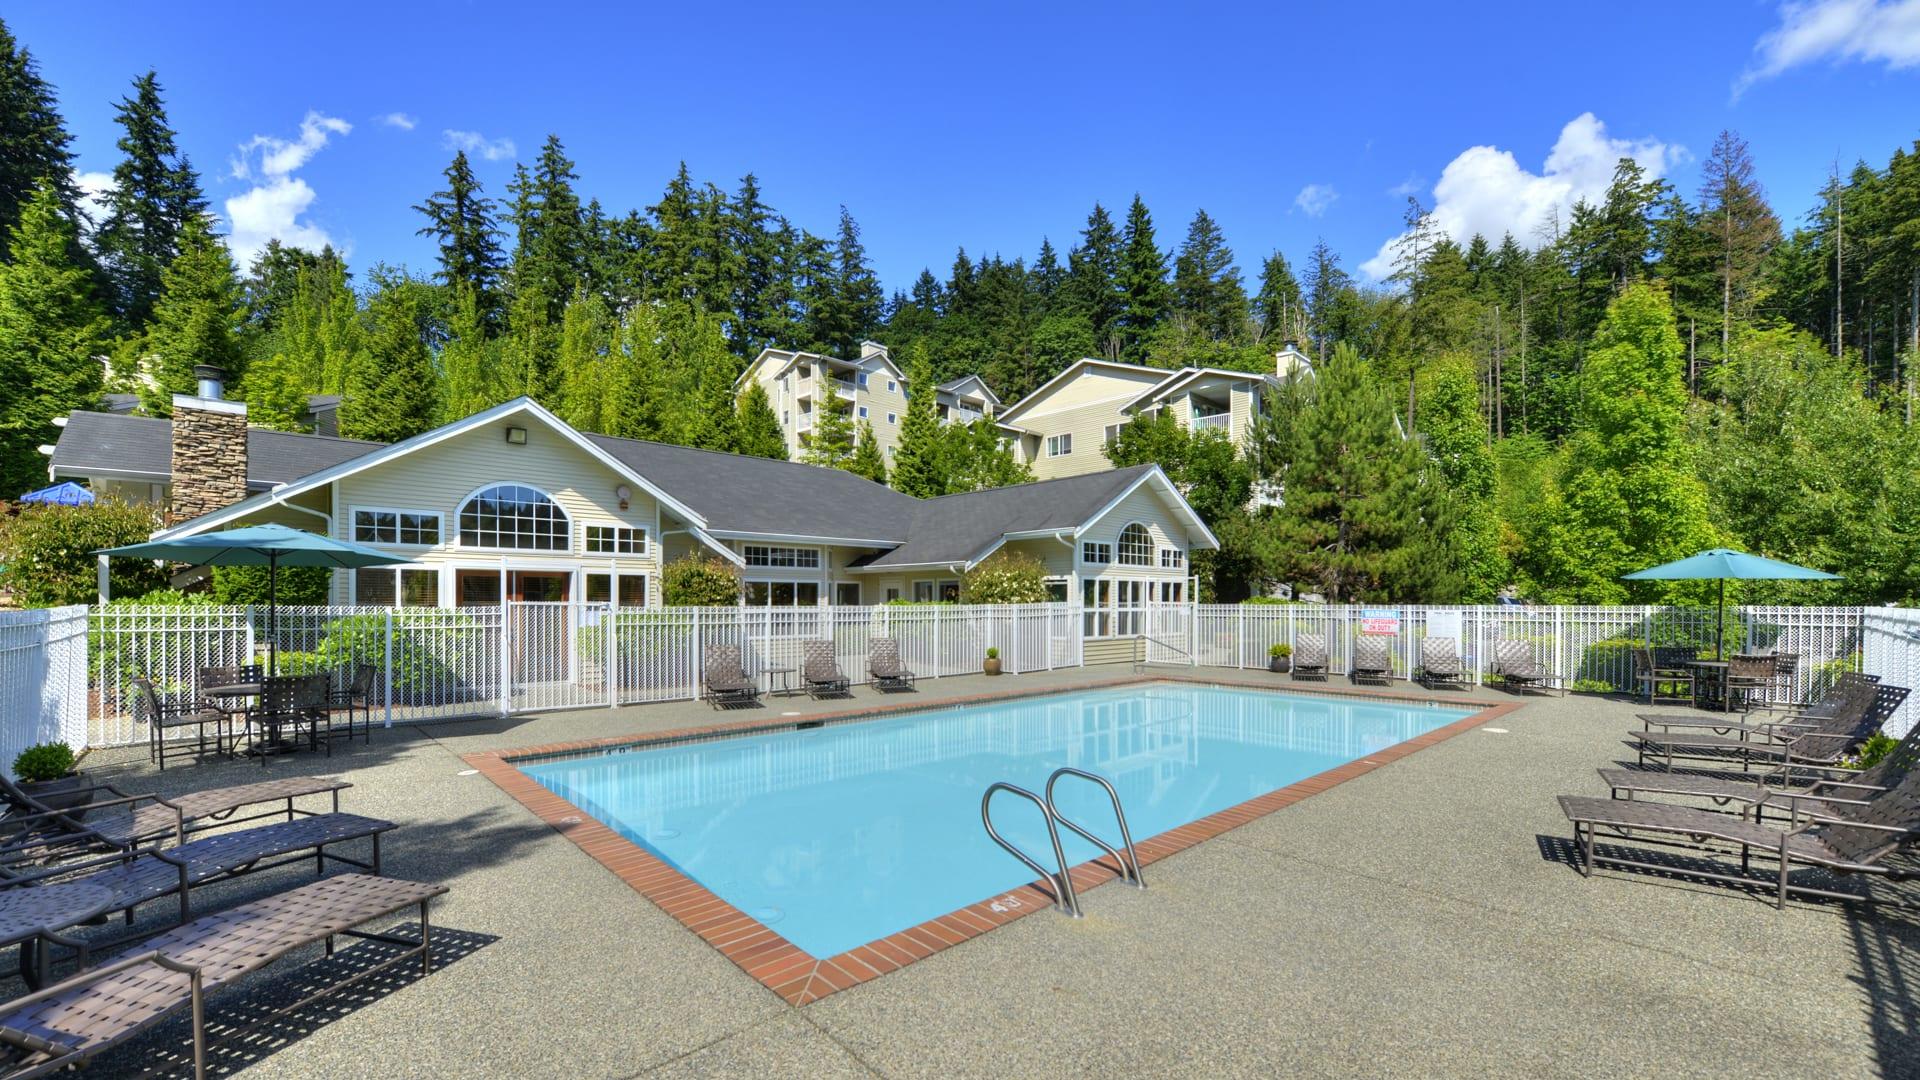 Ivorywood Apartments - Swimming Pool